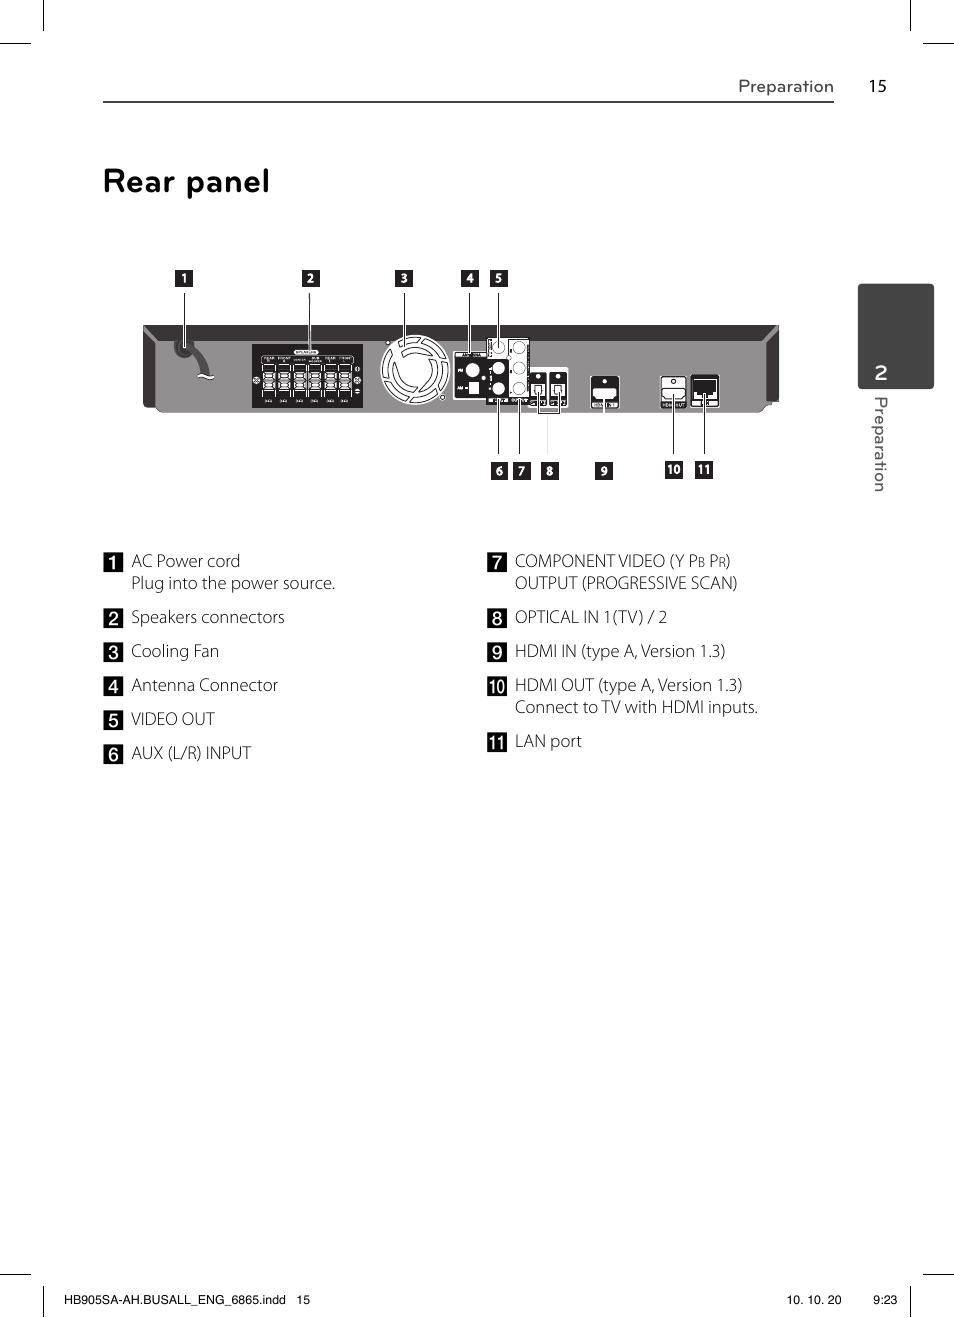 rear panel 15 preparation lg lhb335 user manual page 15 104 rh manualsdir com LG Surround Sound Home Theater System Blu-ray LG LHB536